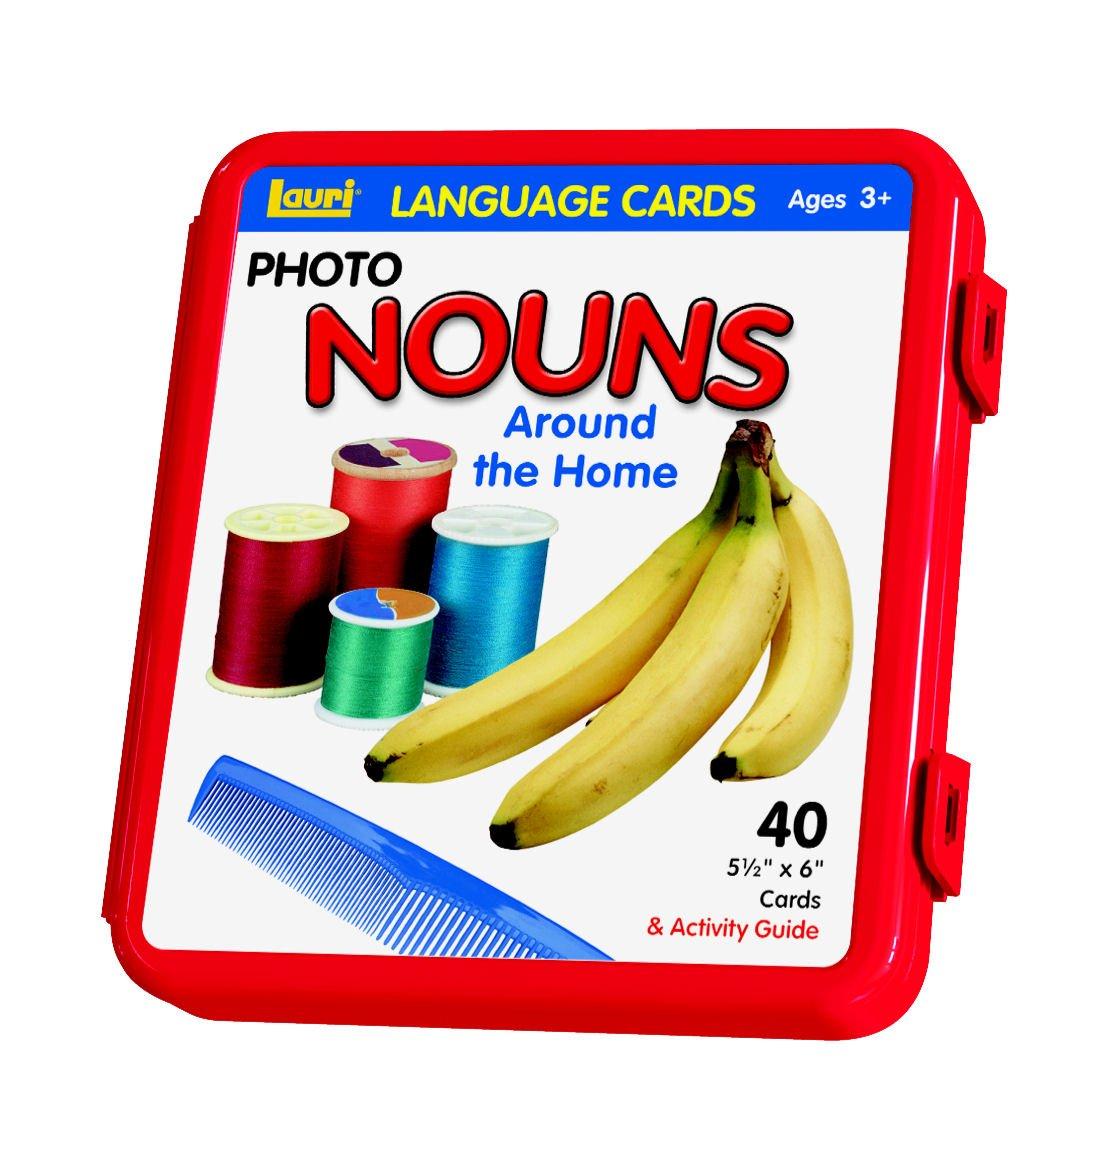 nouns photo cards for teacher classroom students